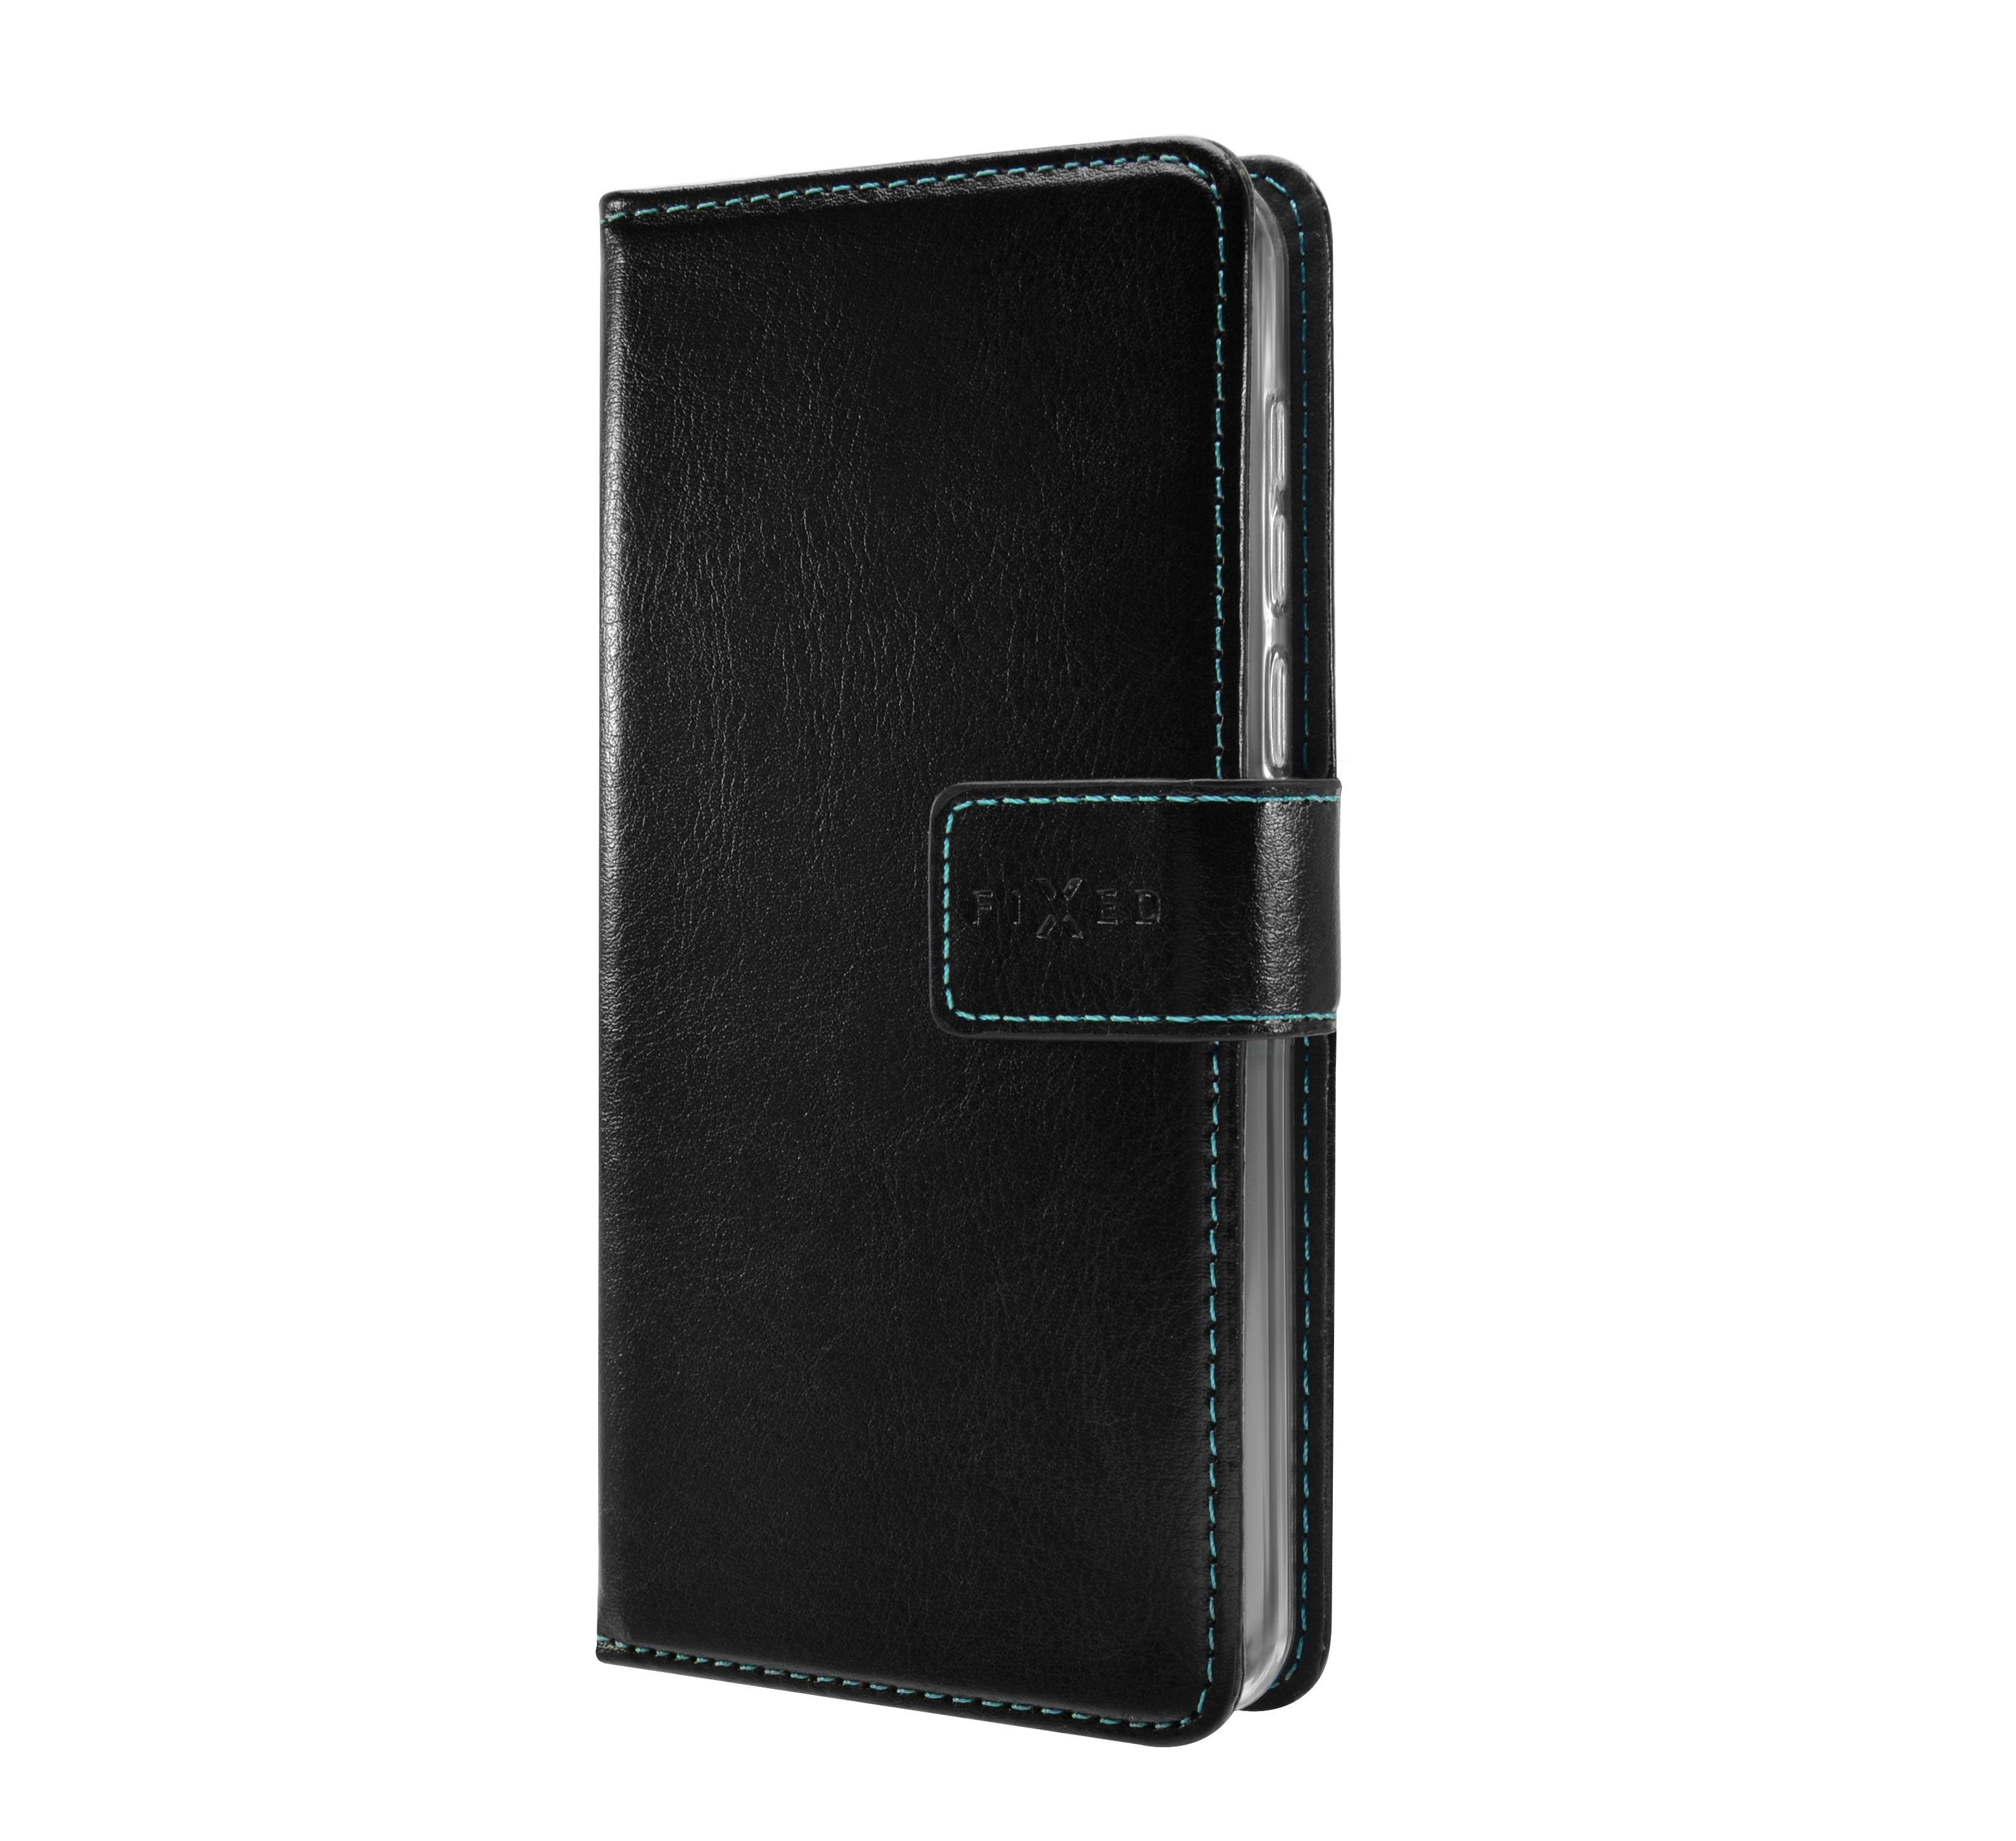 Pouzdro typu kniha FIXED Opus pro Sony Xperia XZ3, černé